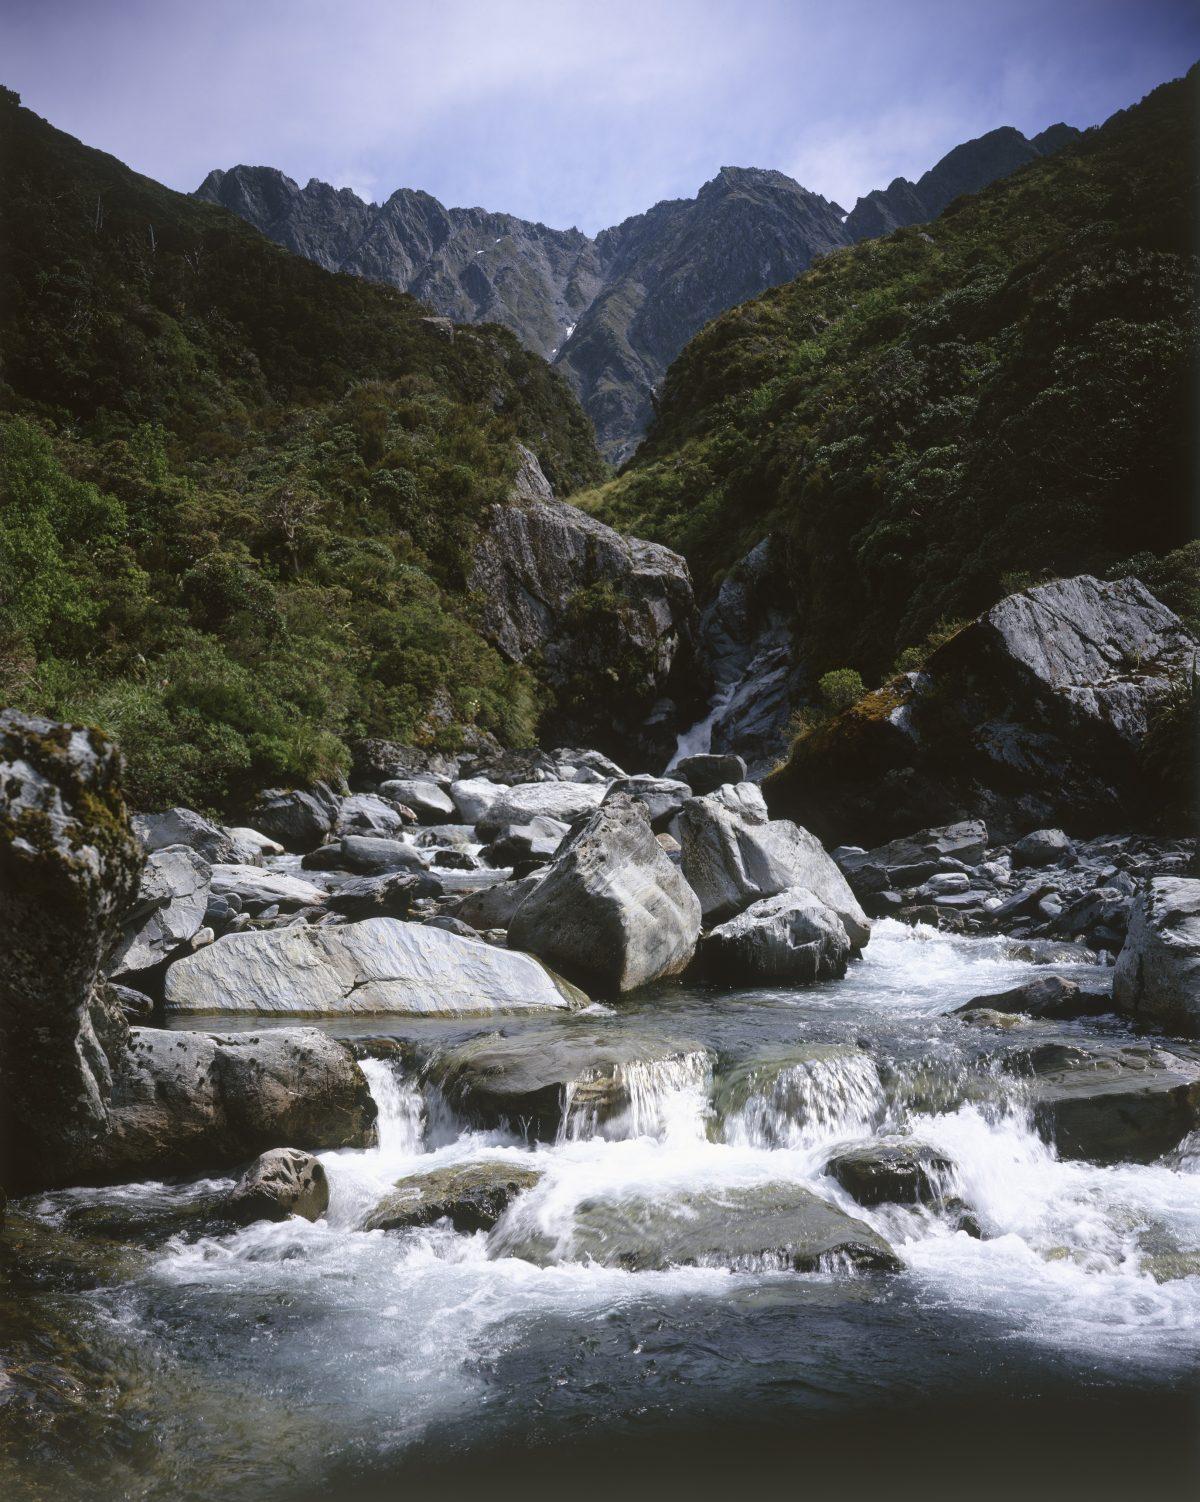 Greenstone water new zealand